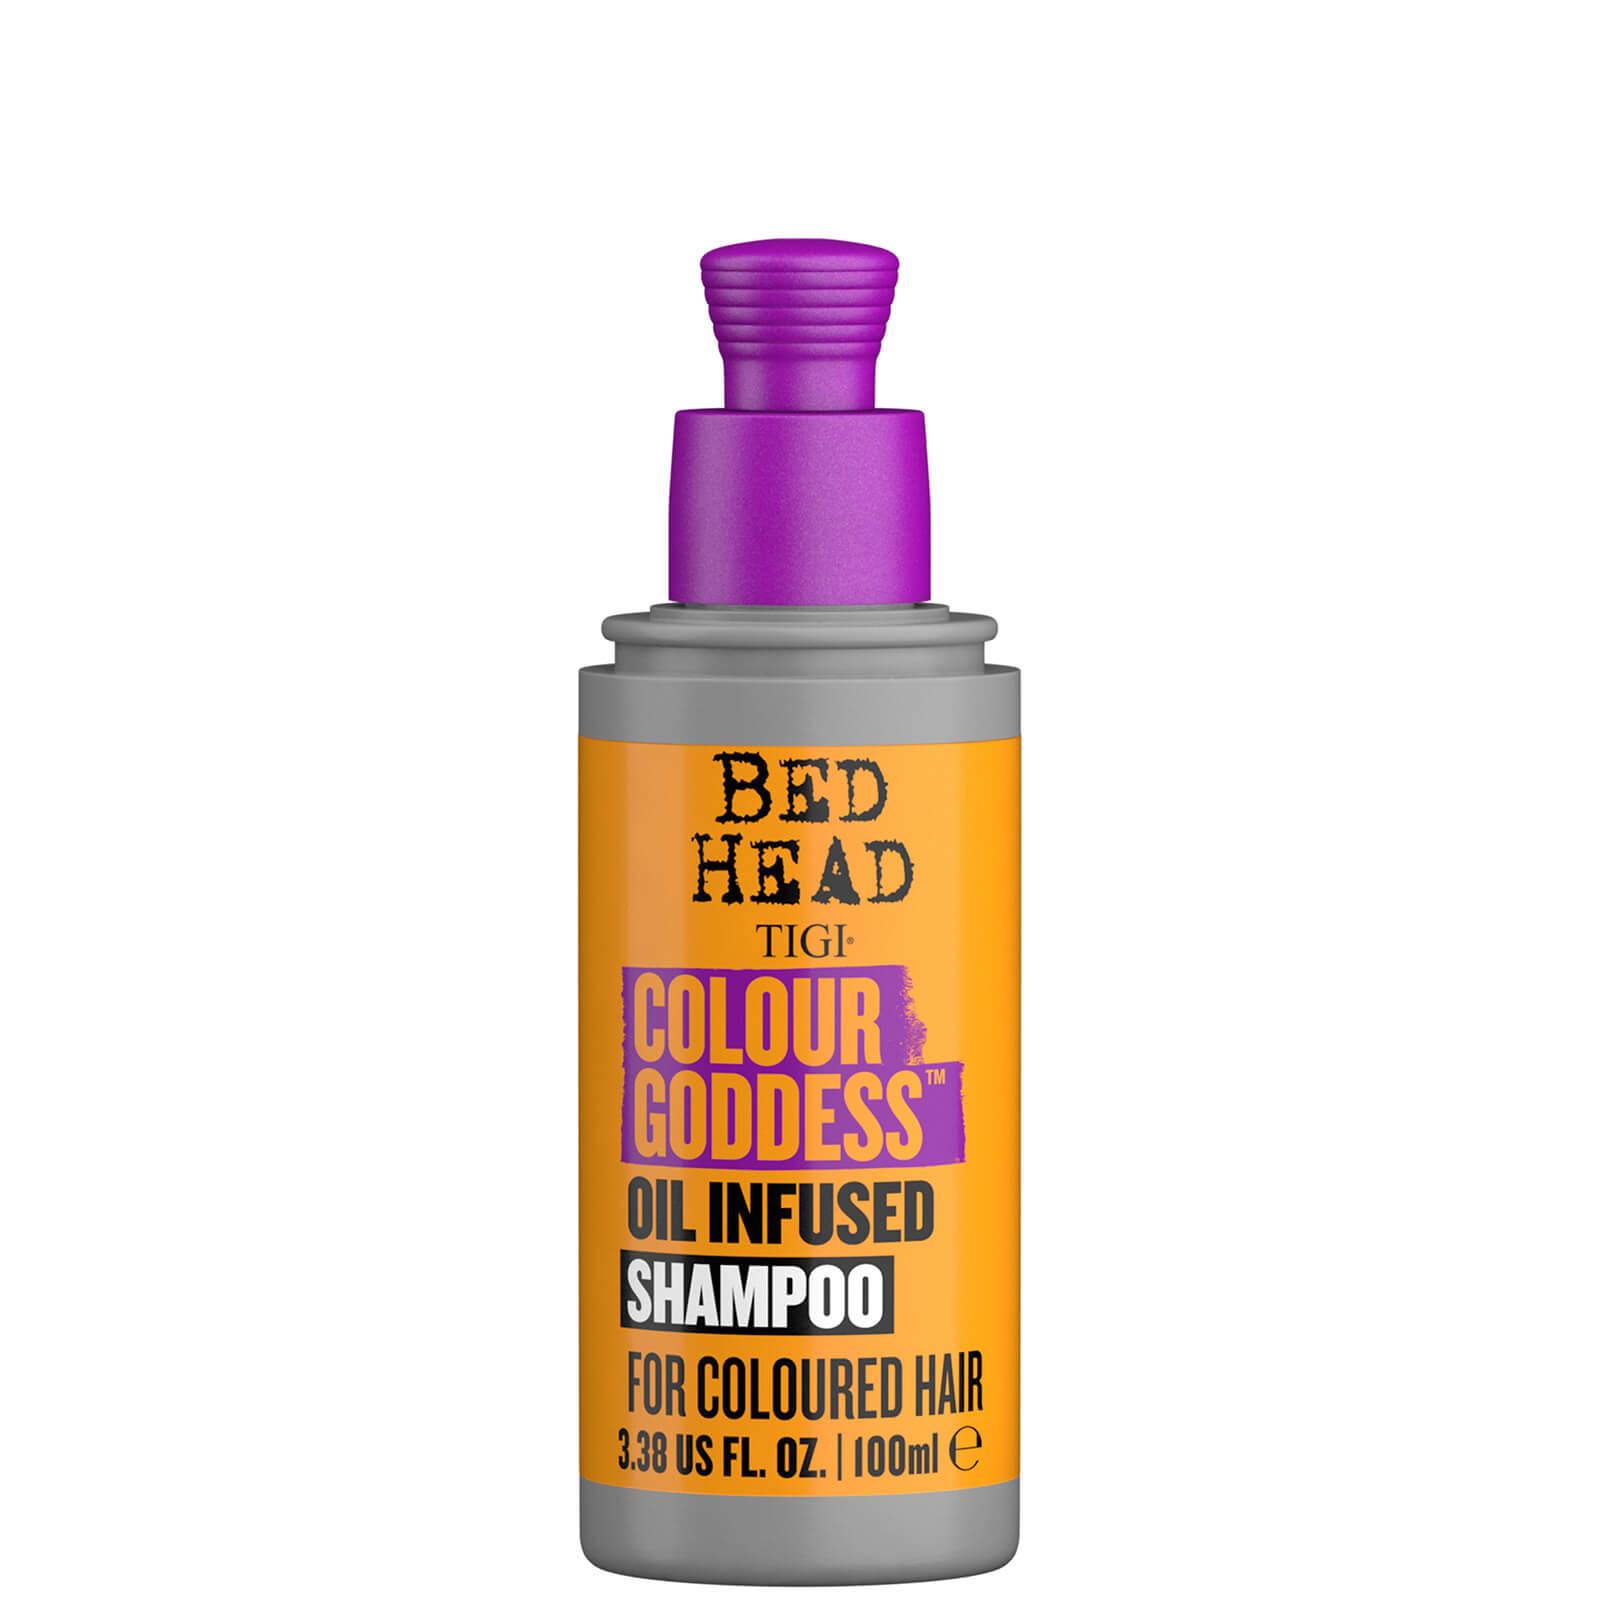 Купить TIGI Bed Head Colour Goddess Travel Size Shampoo for Coloured Hair 100ml